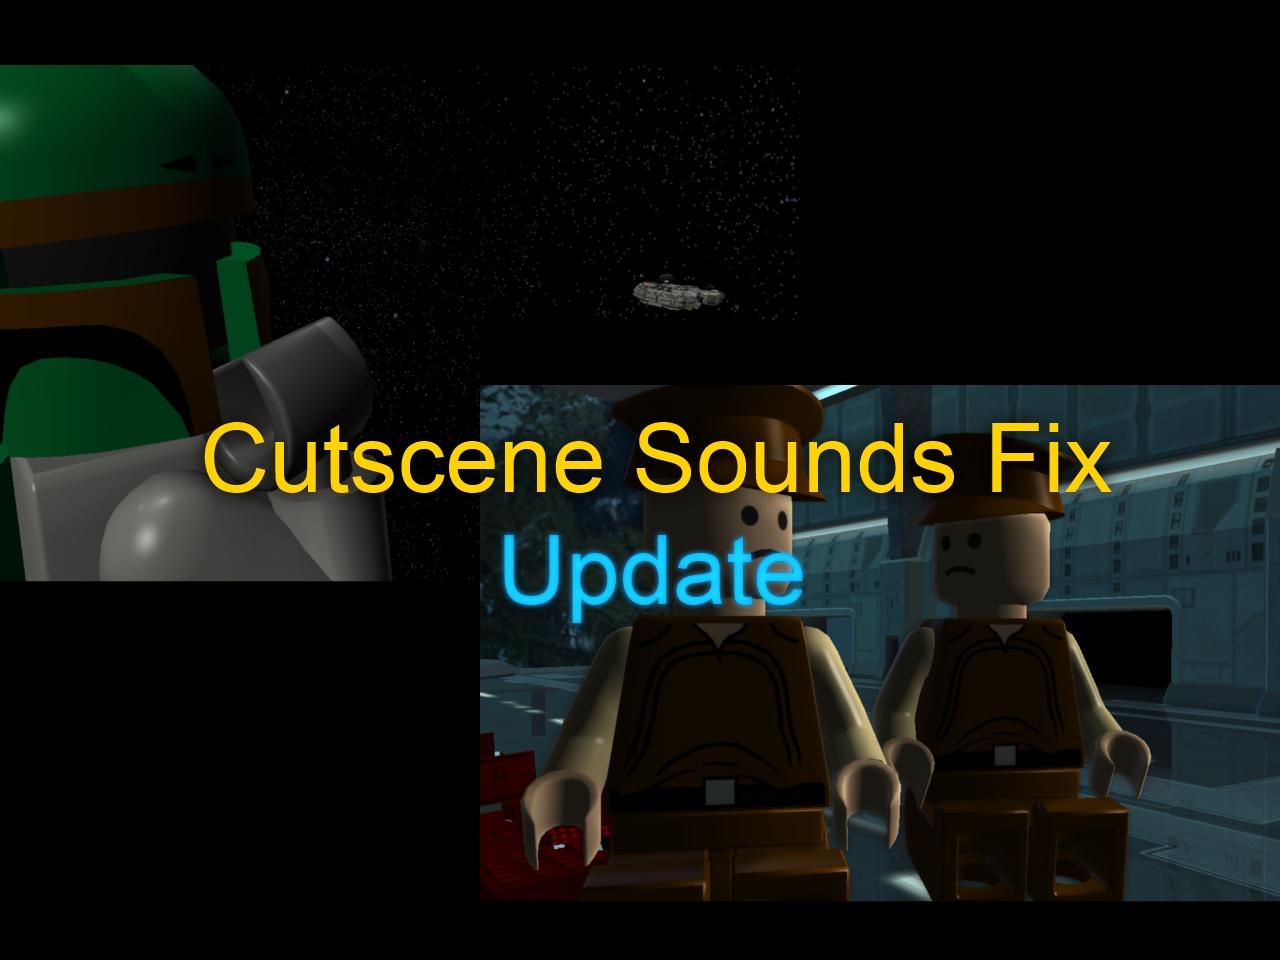 Lego Star Wars The Complete Saga Cutscene Sounds Fix Update